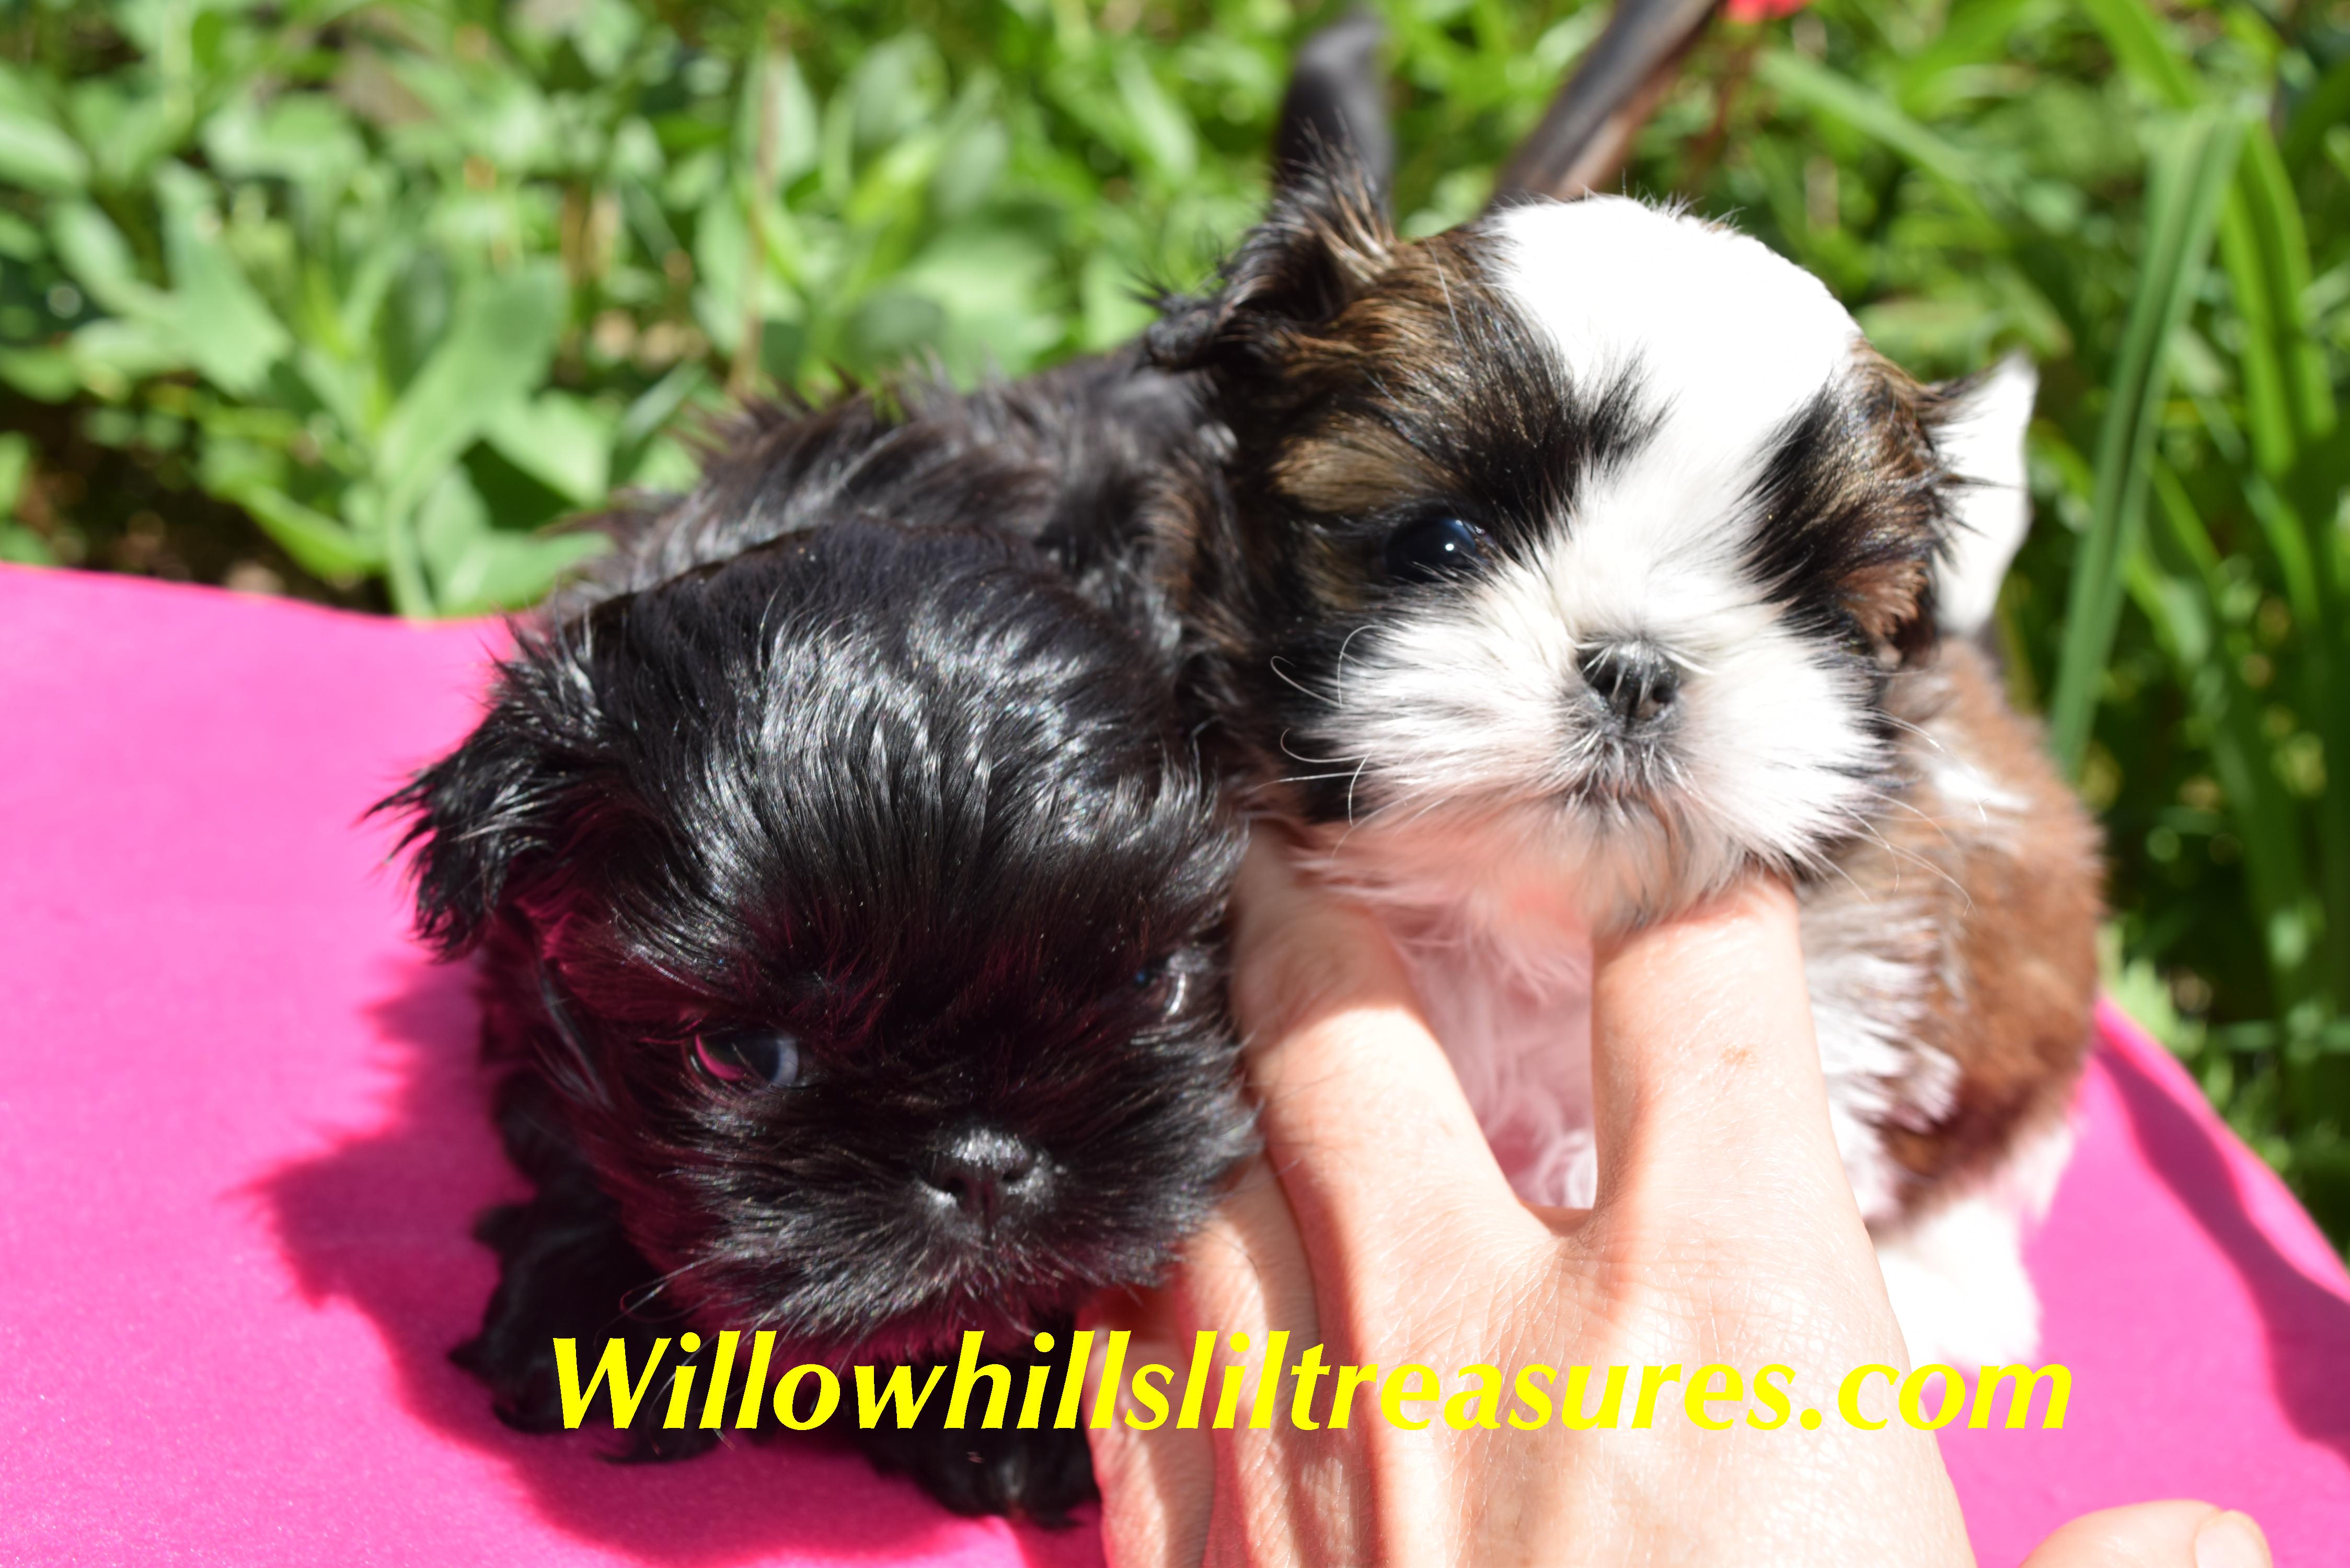 Willowhillsliltreasures Com Shih Tzu Puppy Puppies Little Puppies